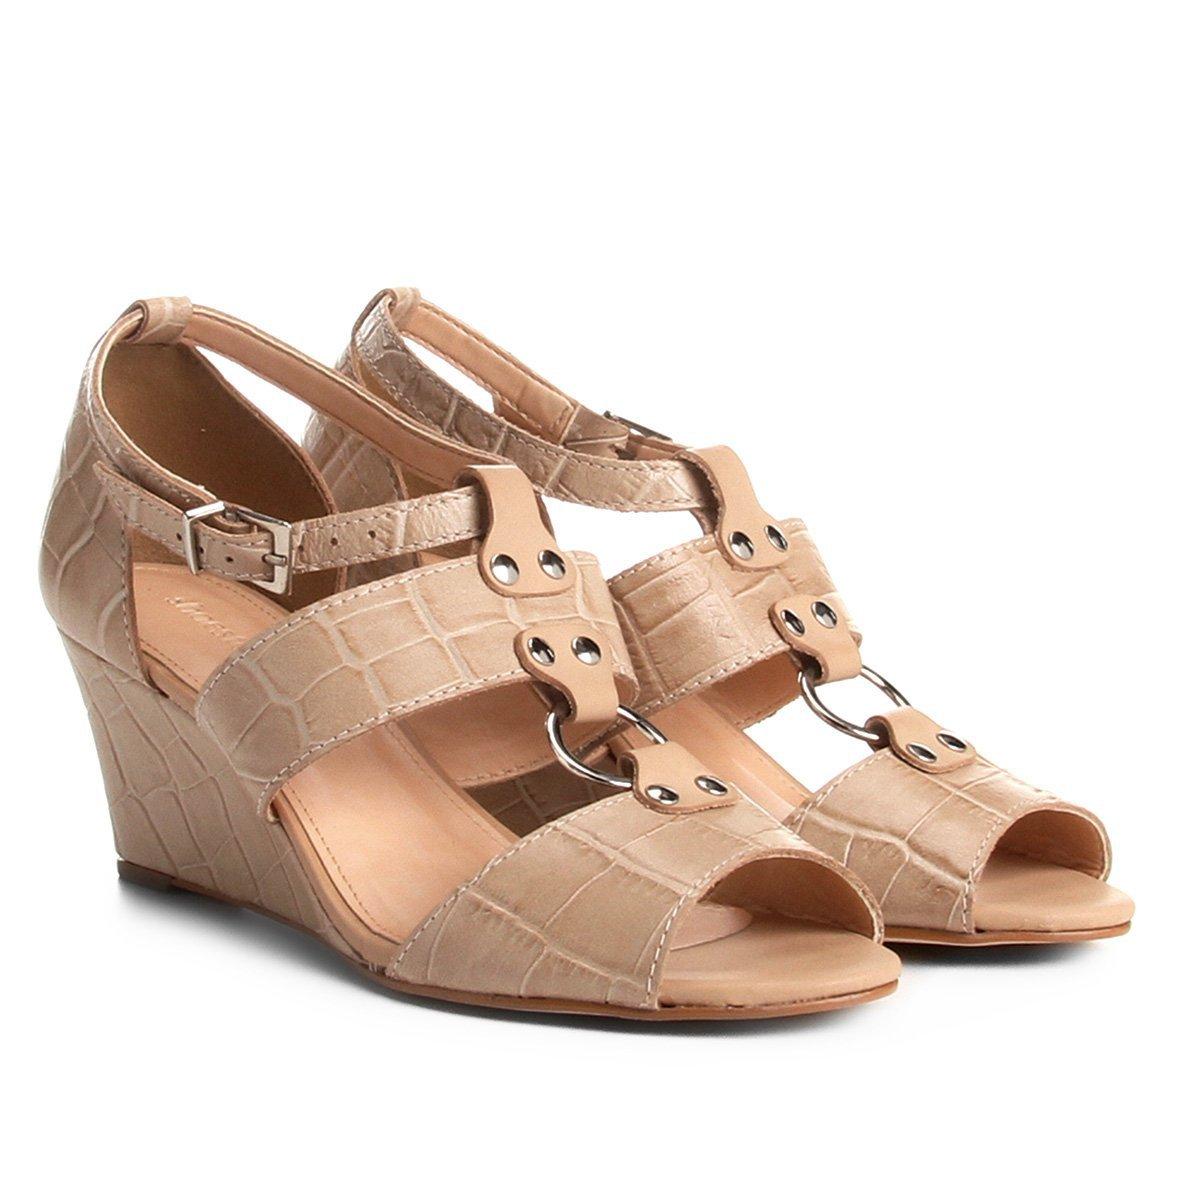 d06e02c383 Sandália Anabela Couro Shoestock Croco Feminina